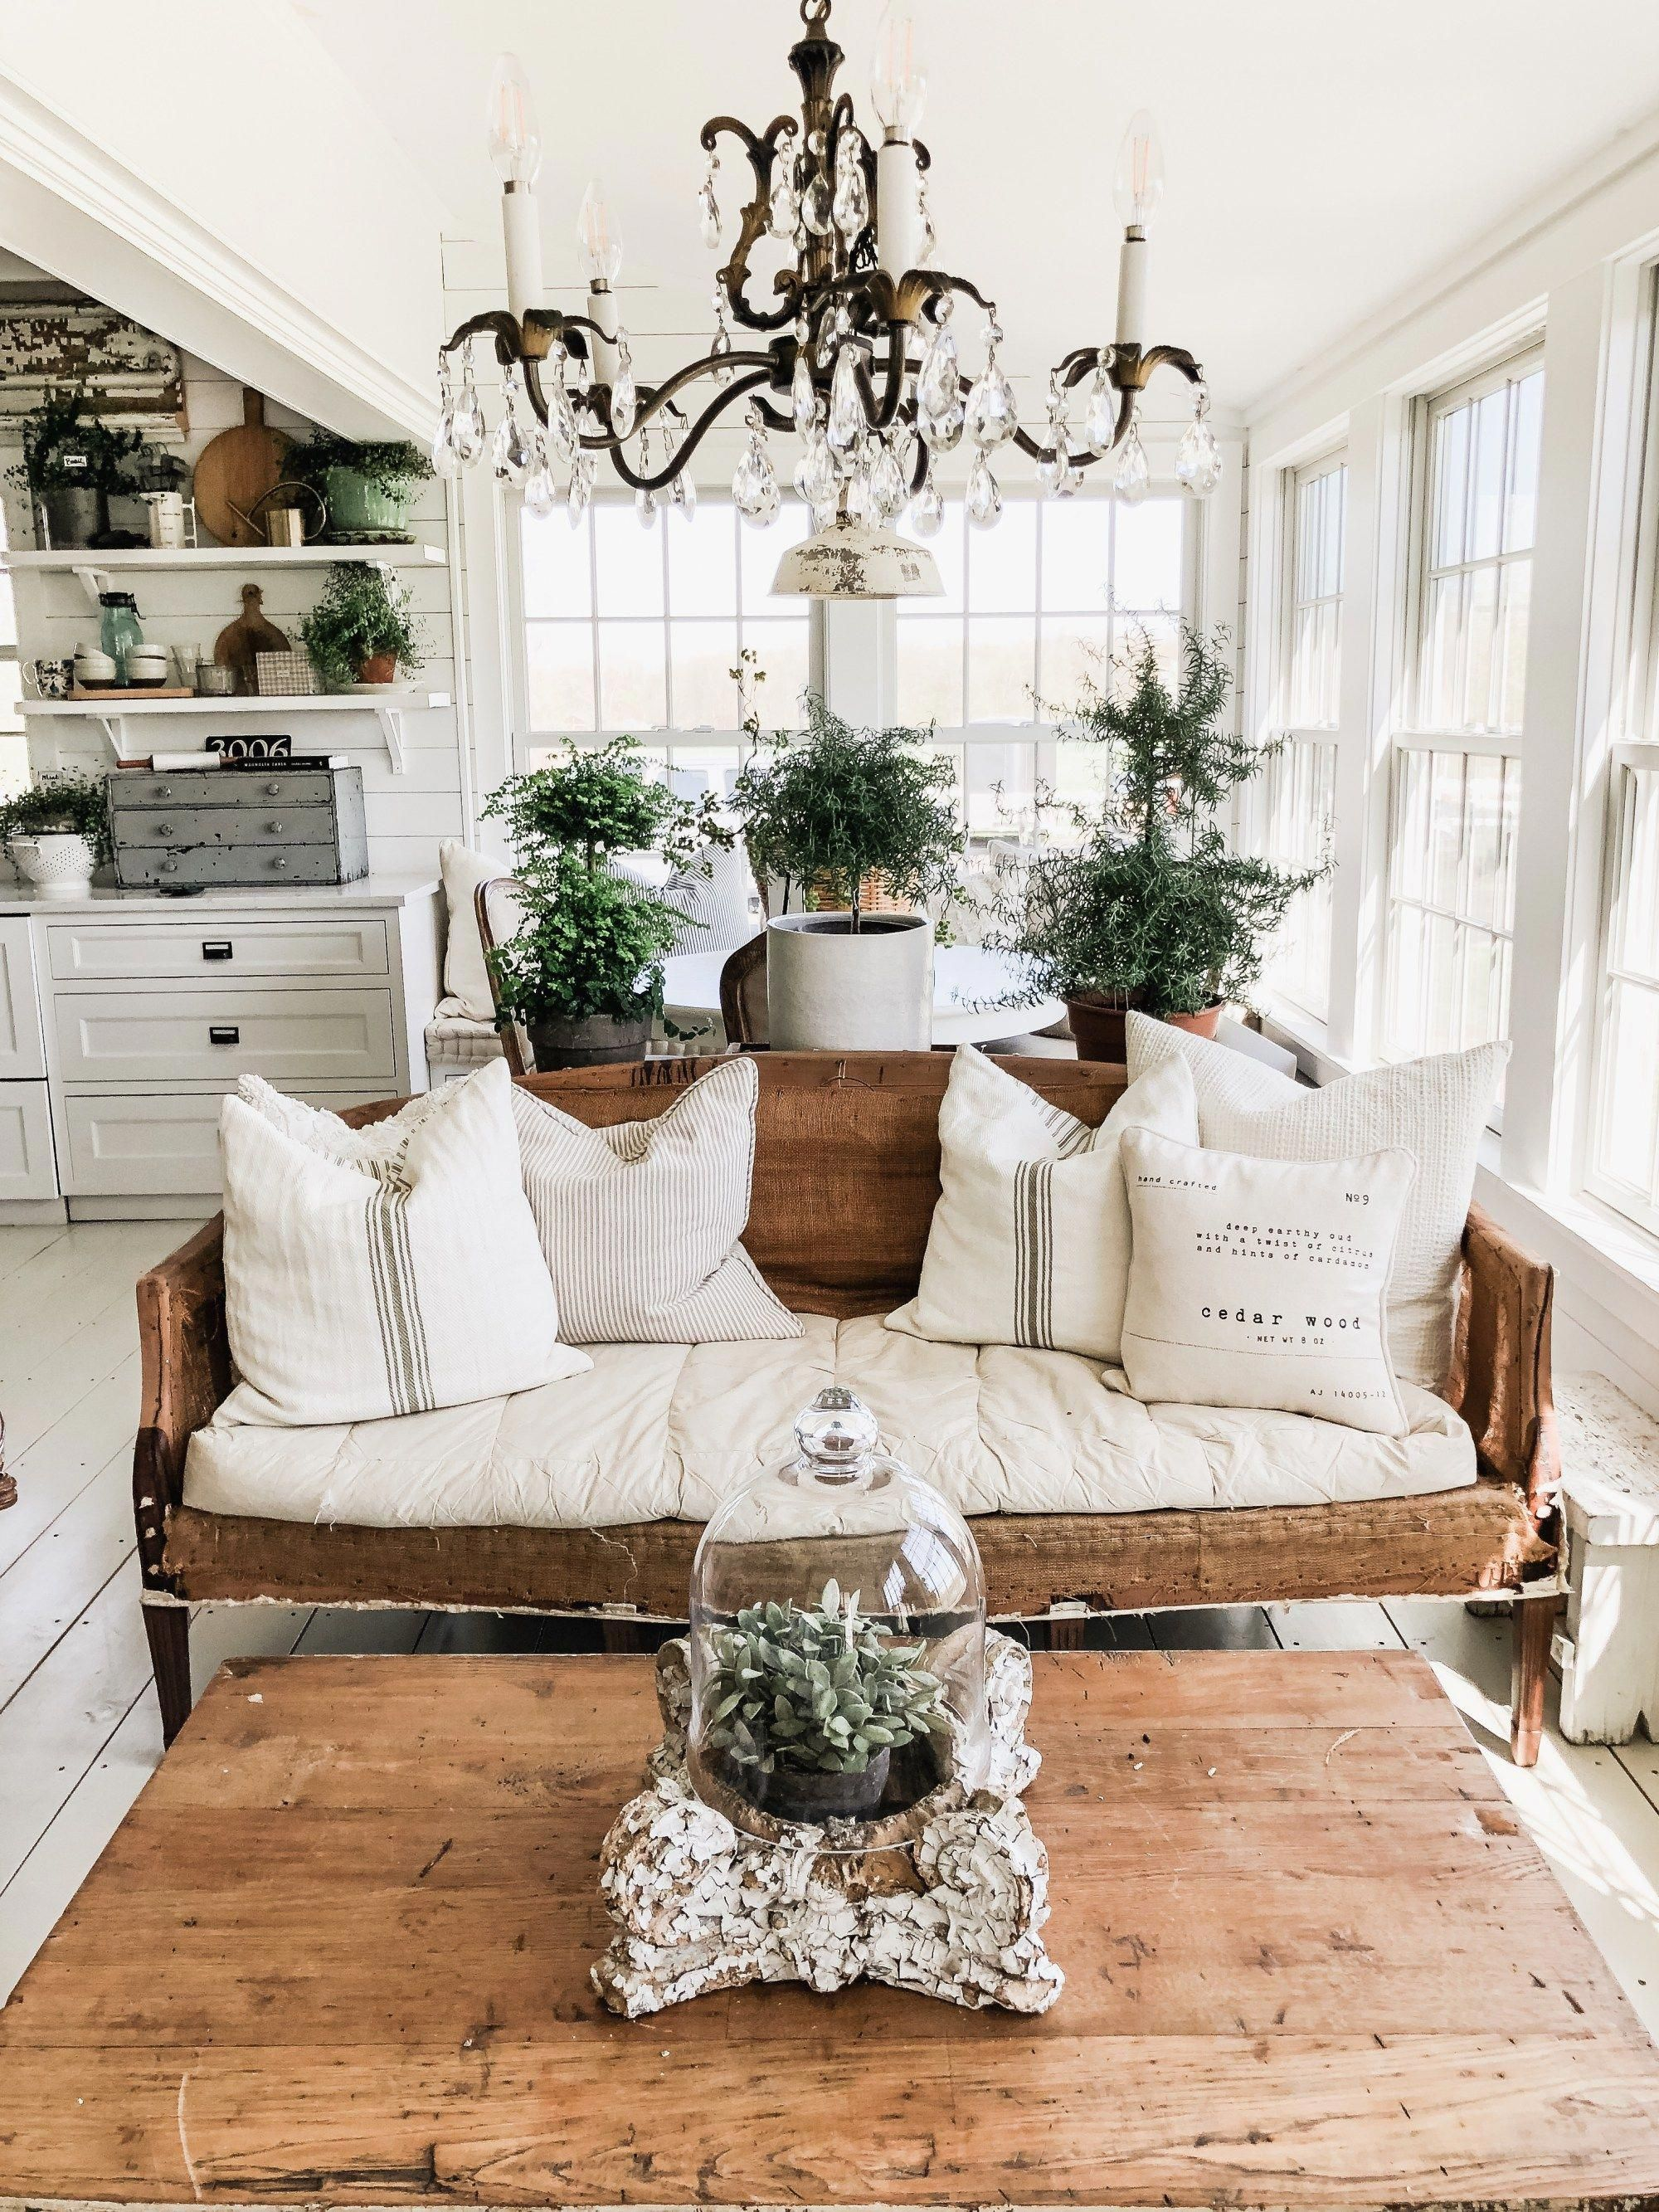 Early Summer Home Tour Liz Marie Blog livingroomdesigns